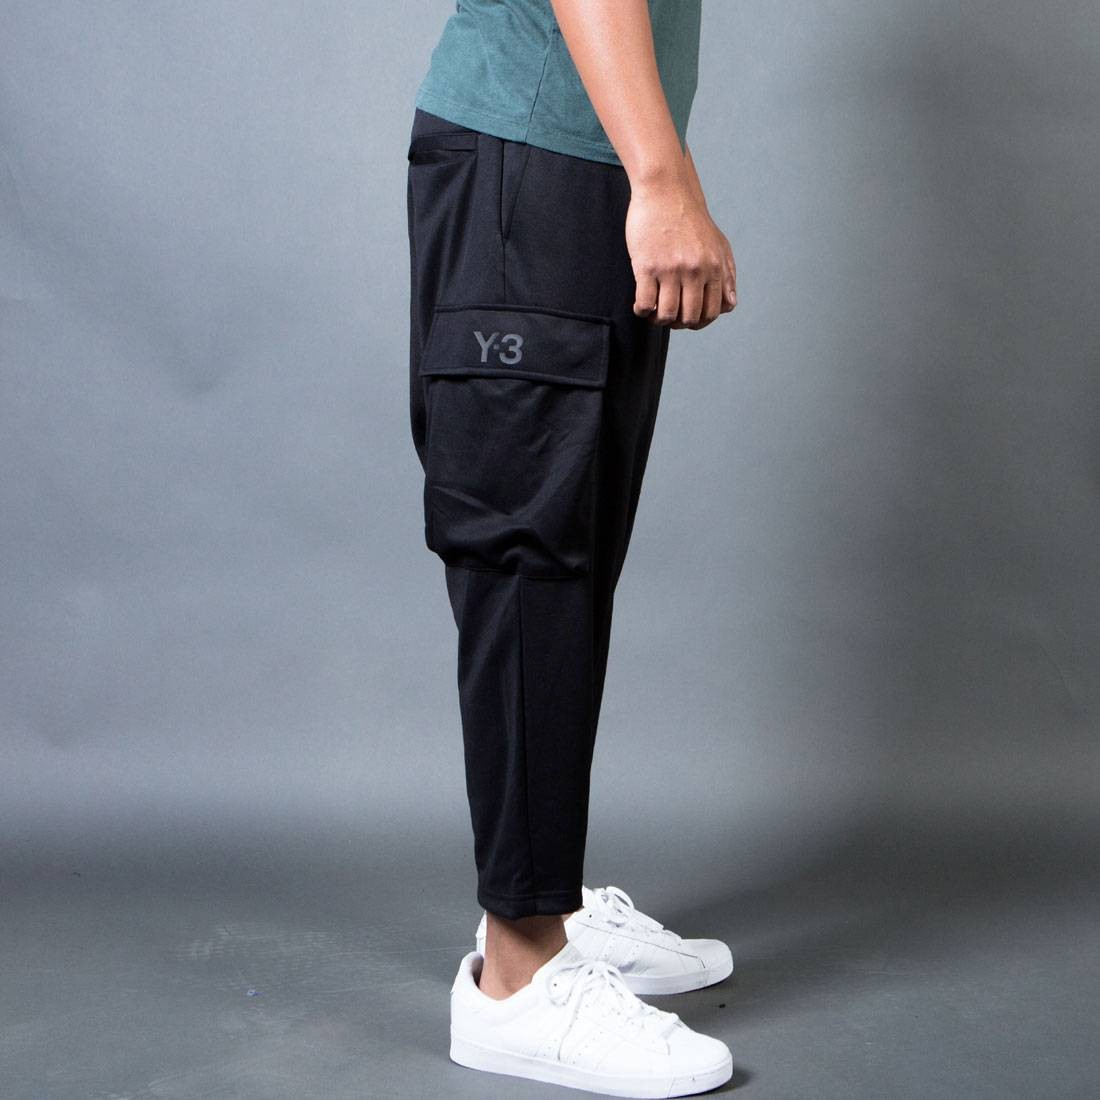 adidas y3 pants